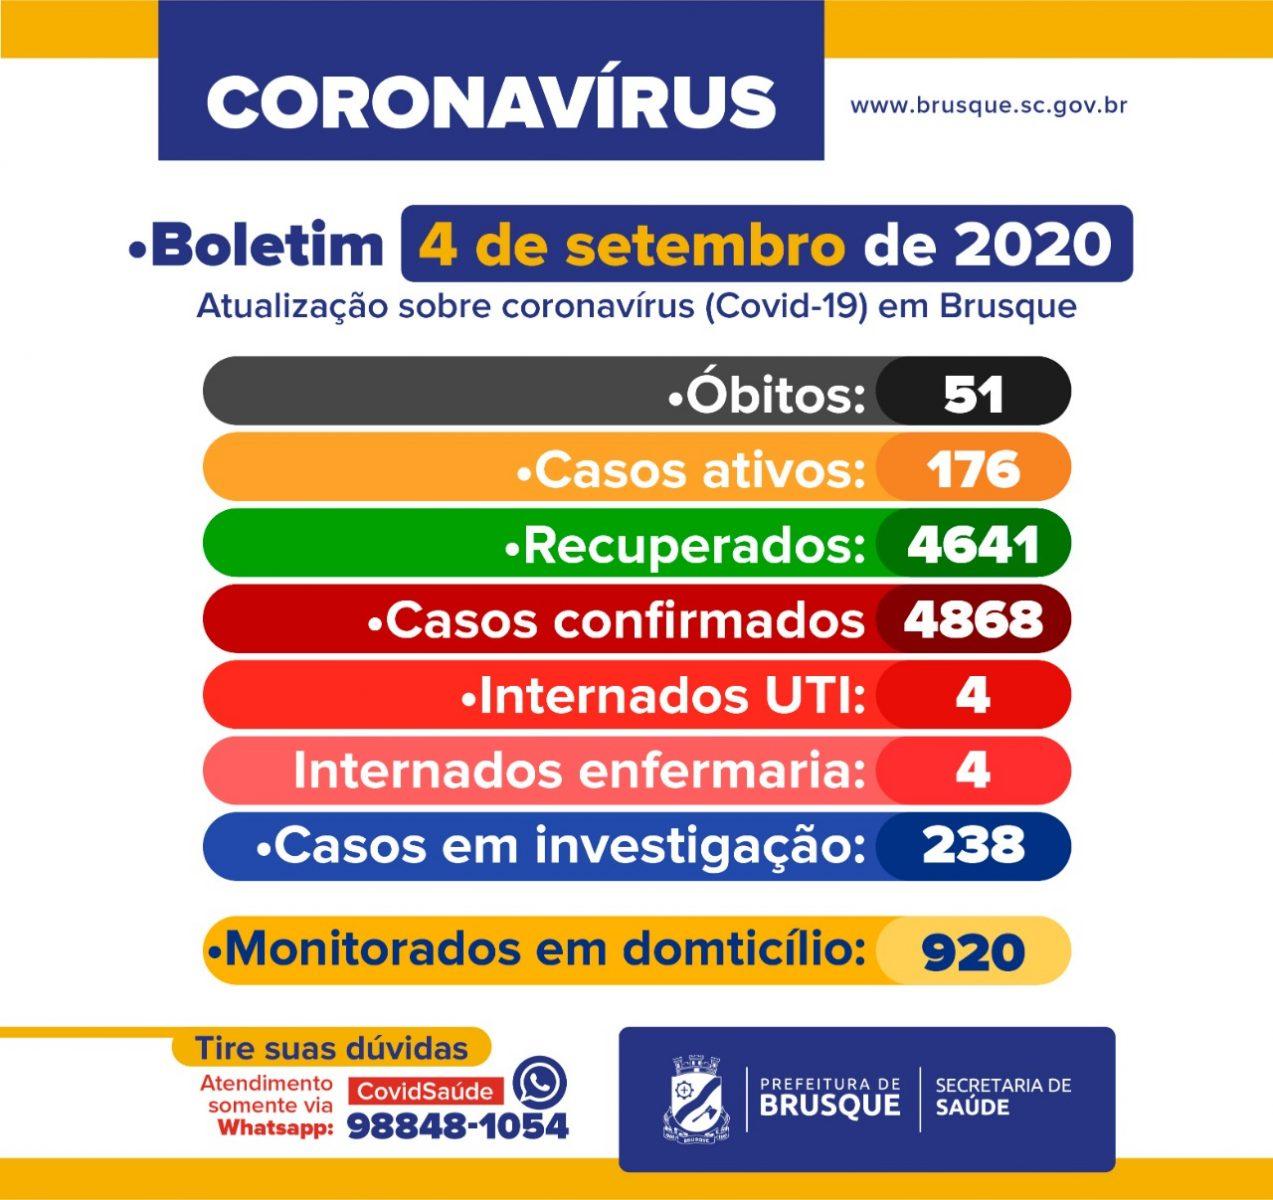 COVID-19: Boletim epidemiológico desta sexta-feira, 4 de setembro